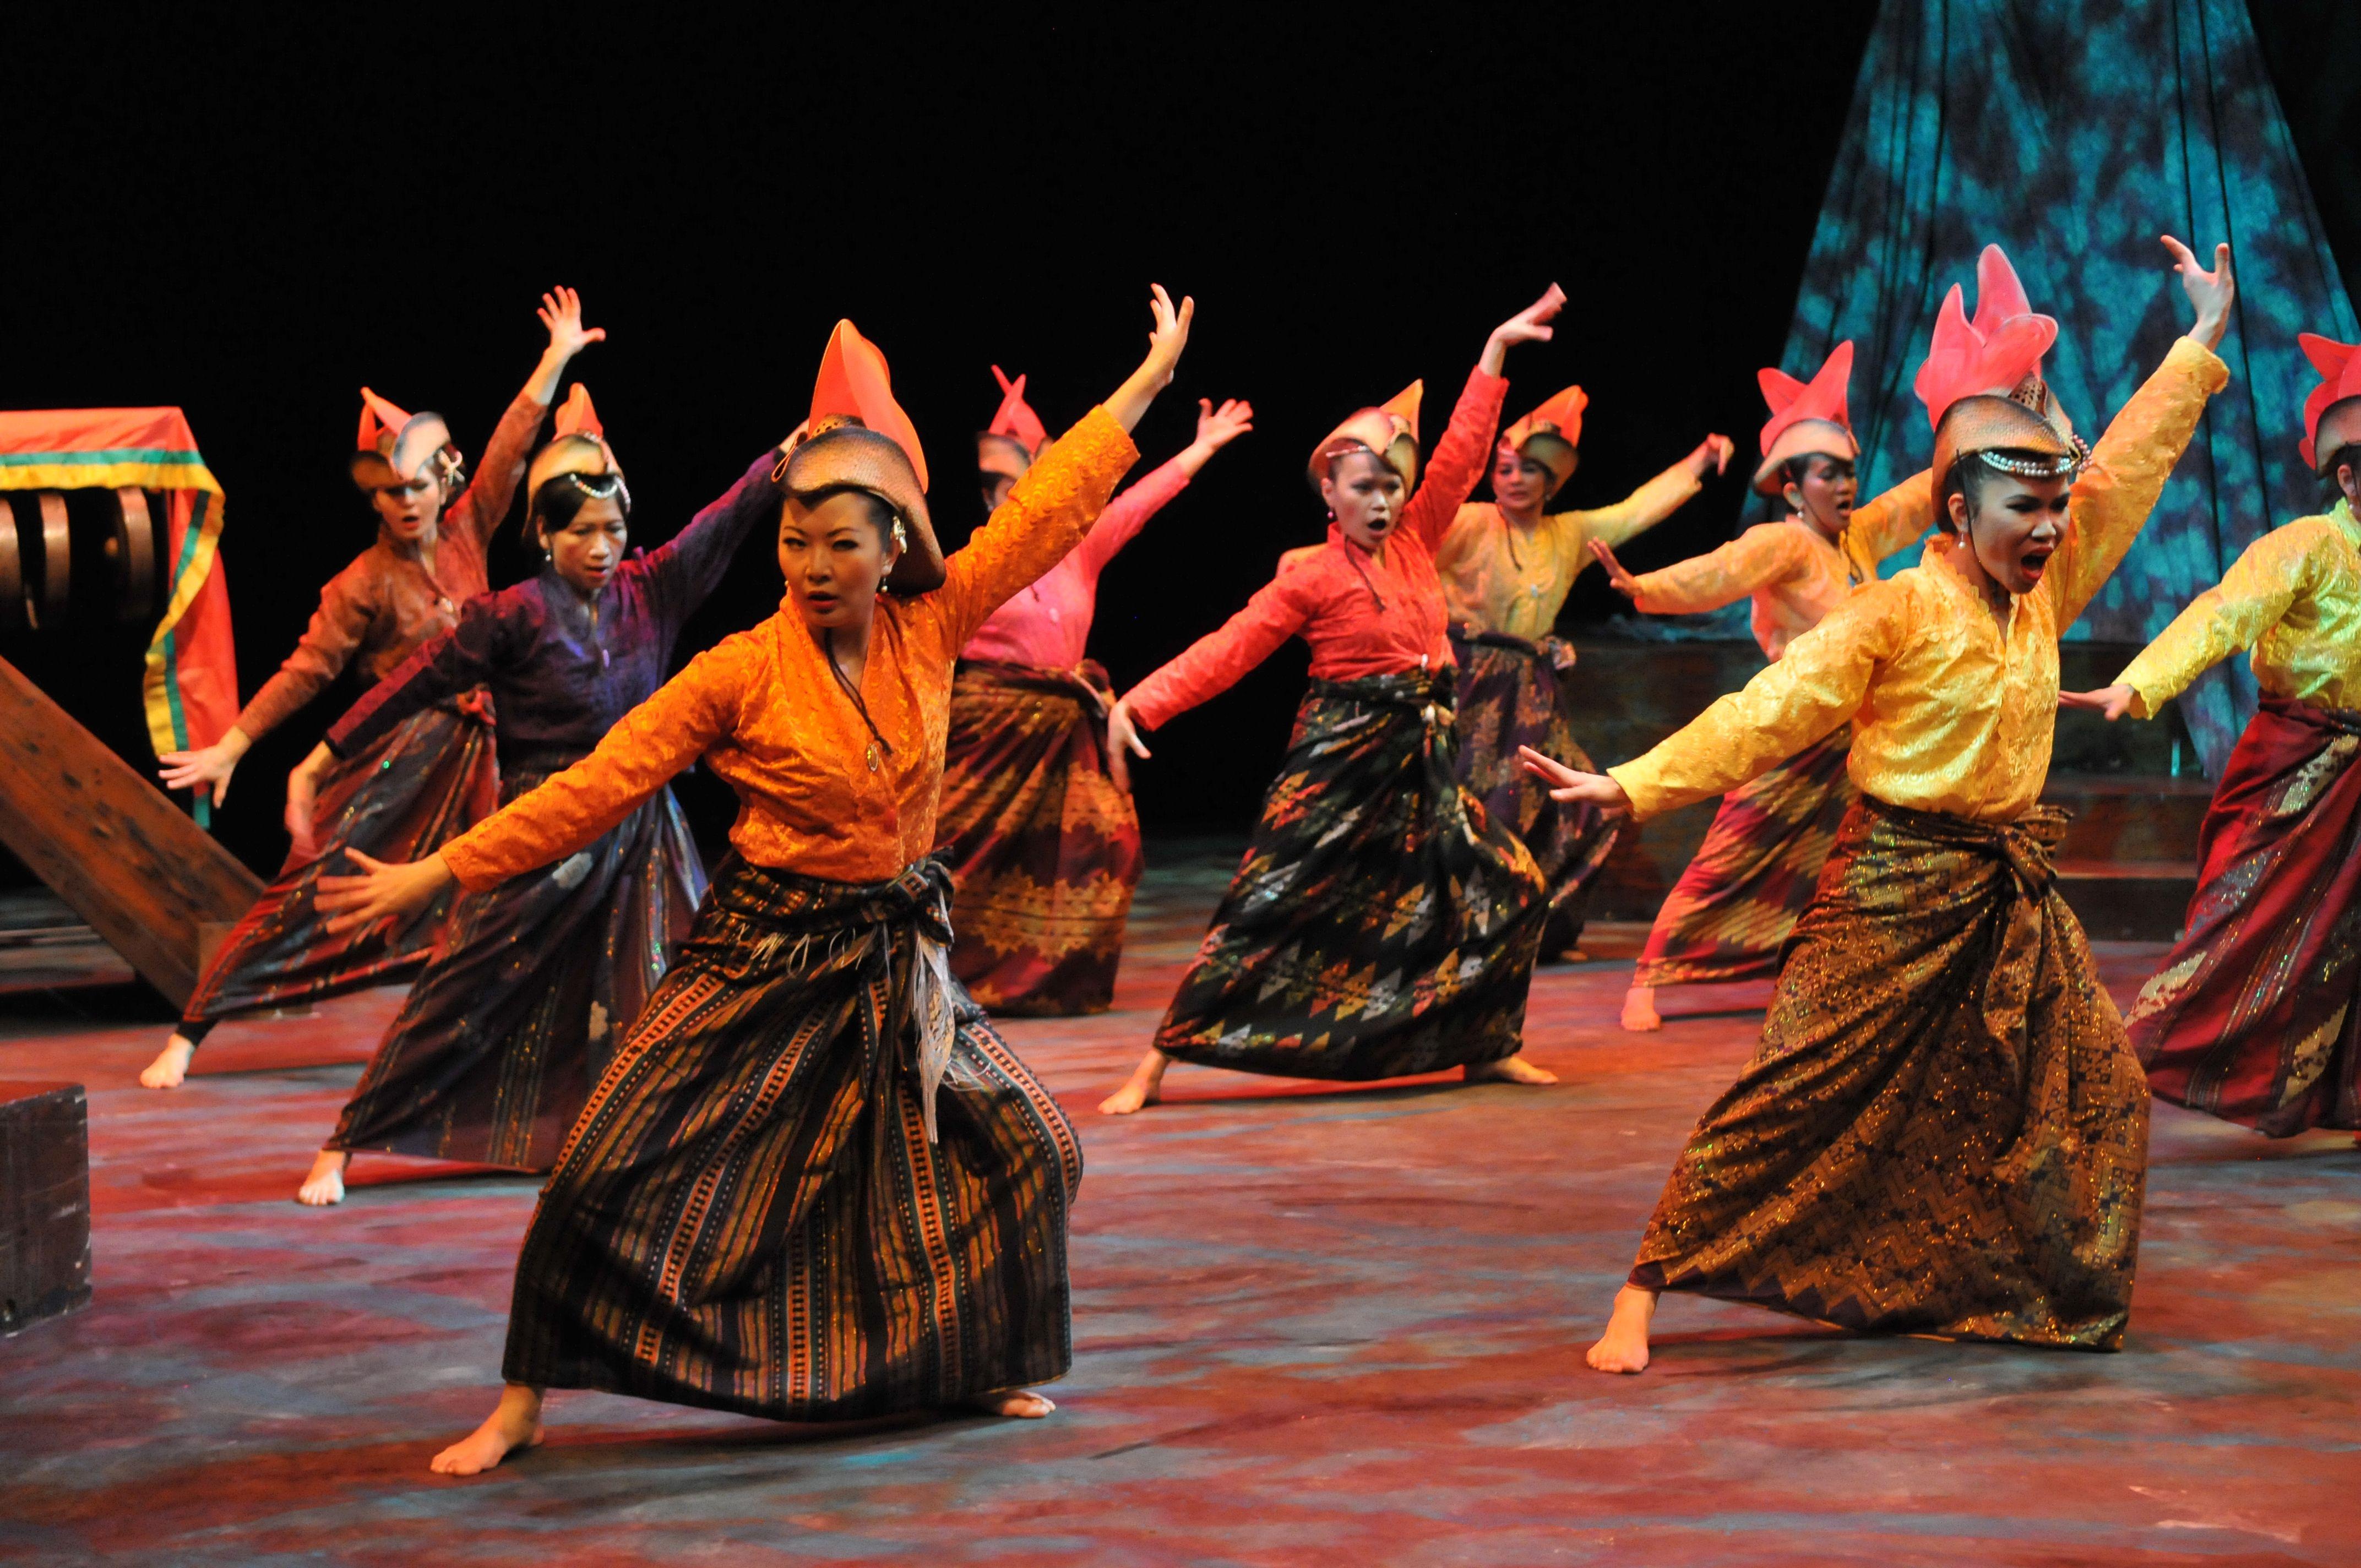 Parangal dance company philippine folk dance - Kinding Sindaw At Pagbabalik Tracing The Path Home Www Kindingsindaw Org Mindanaodance Musicphilippinespaths